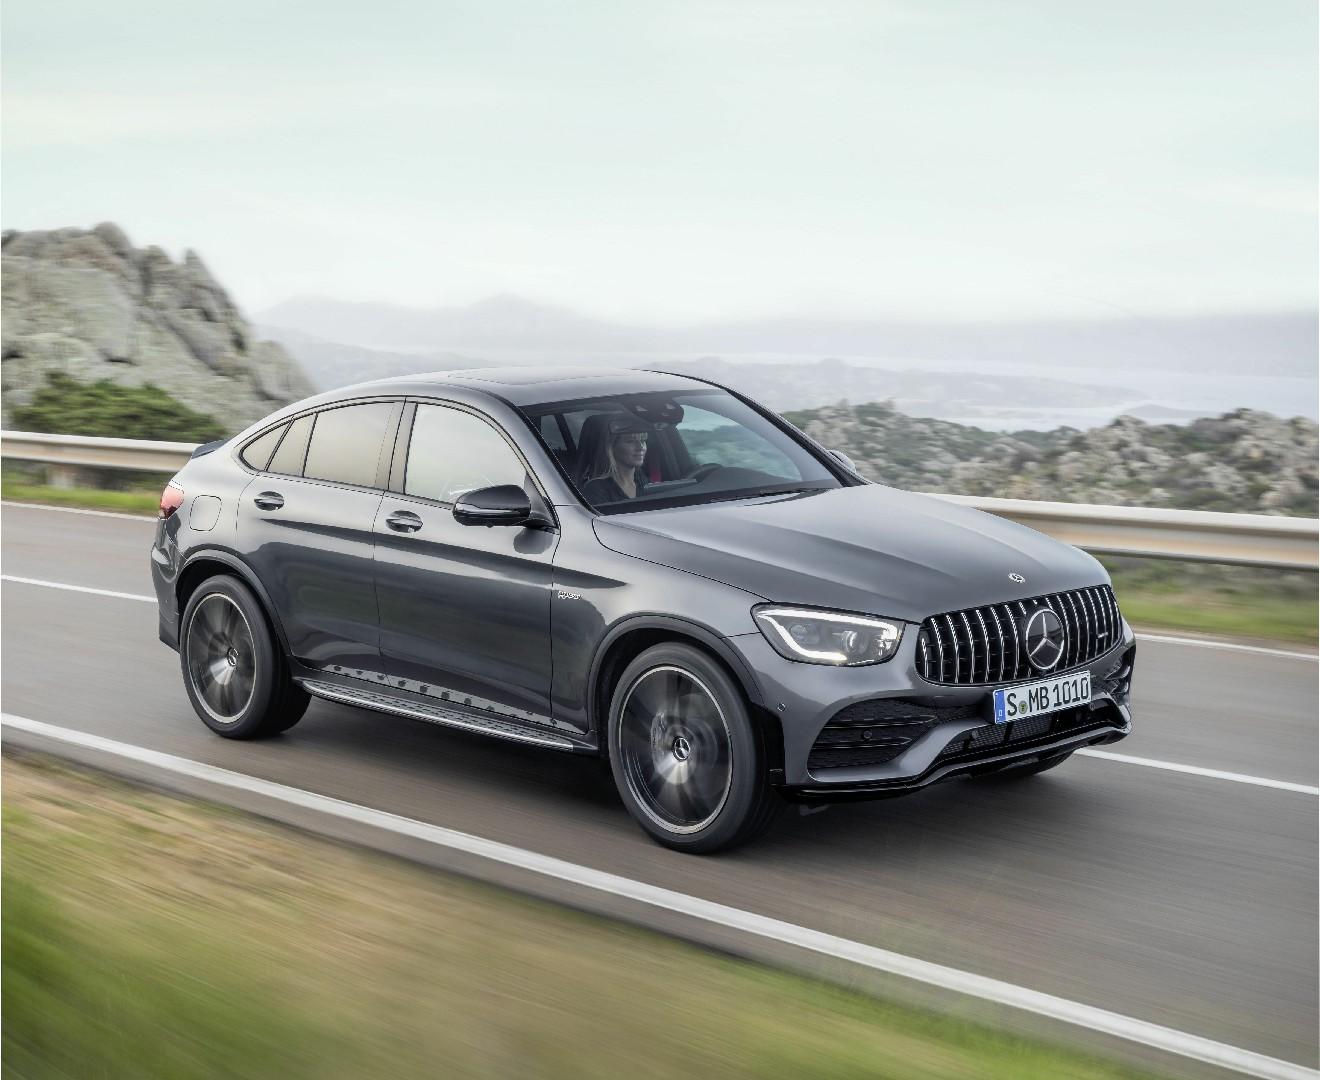 Mercedes-AMG GLC 43 Coupé 4Matic 2020